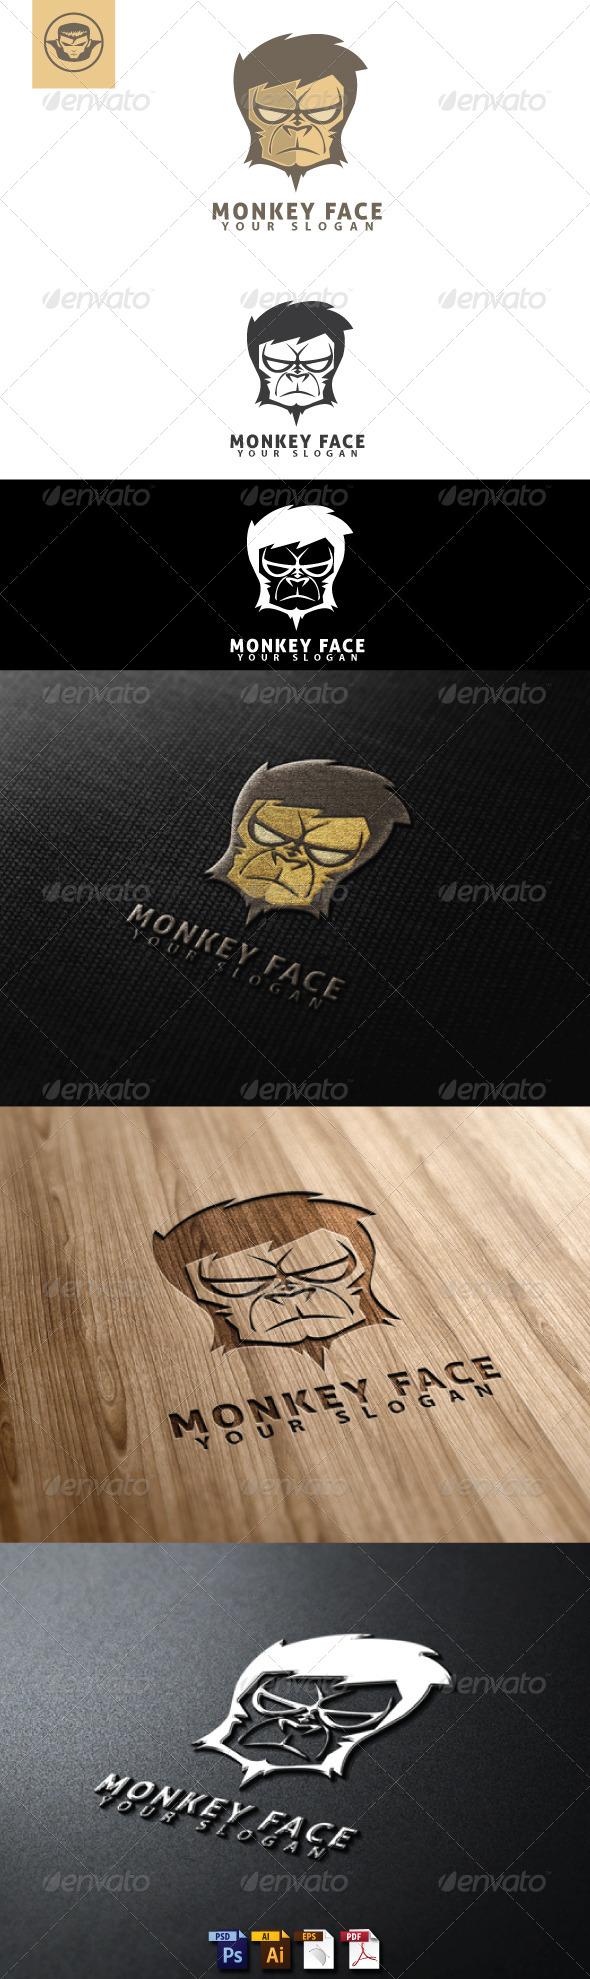 Monkey Face Logo Template - Animals Logo Templates